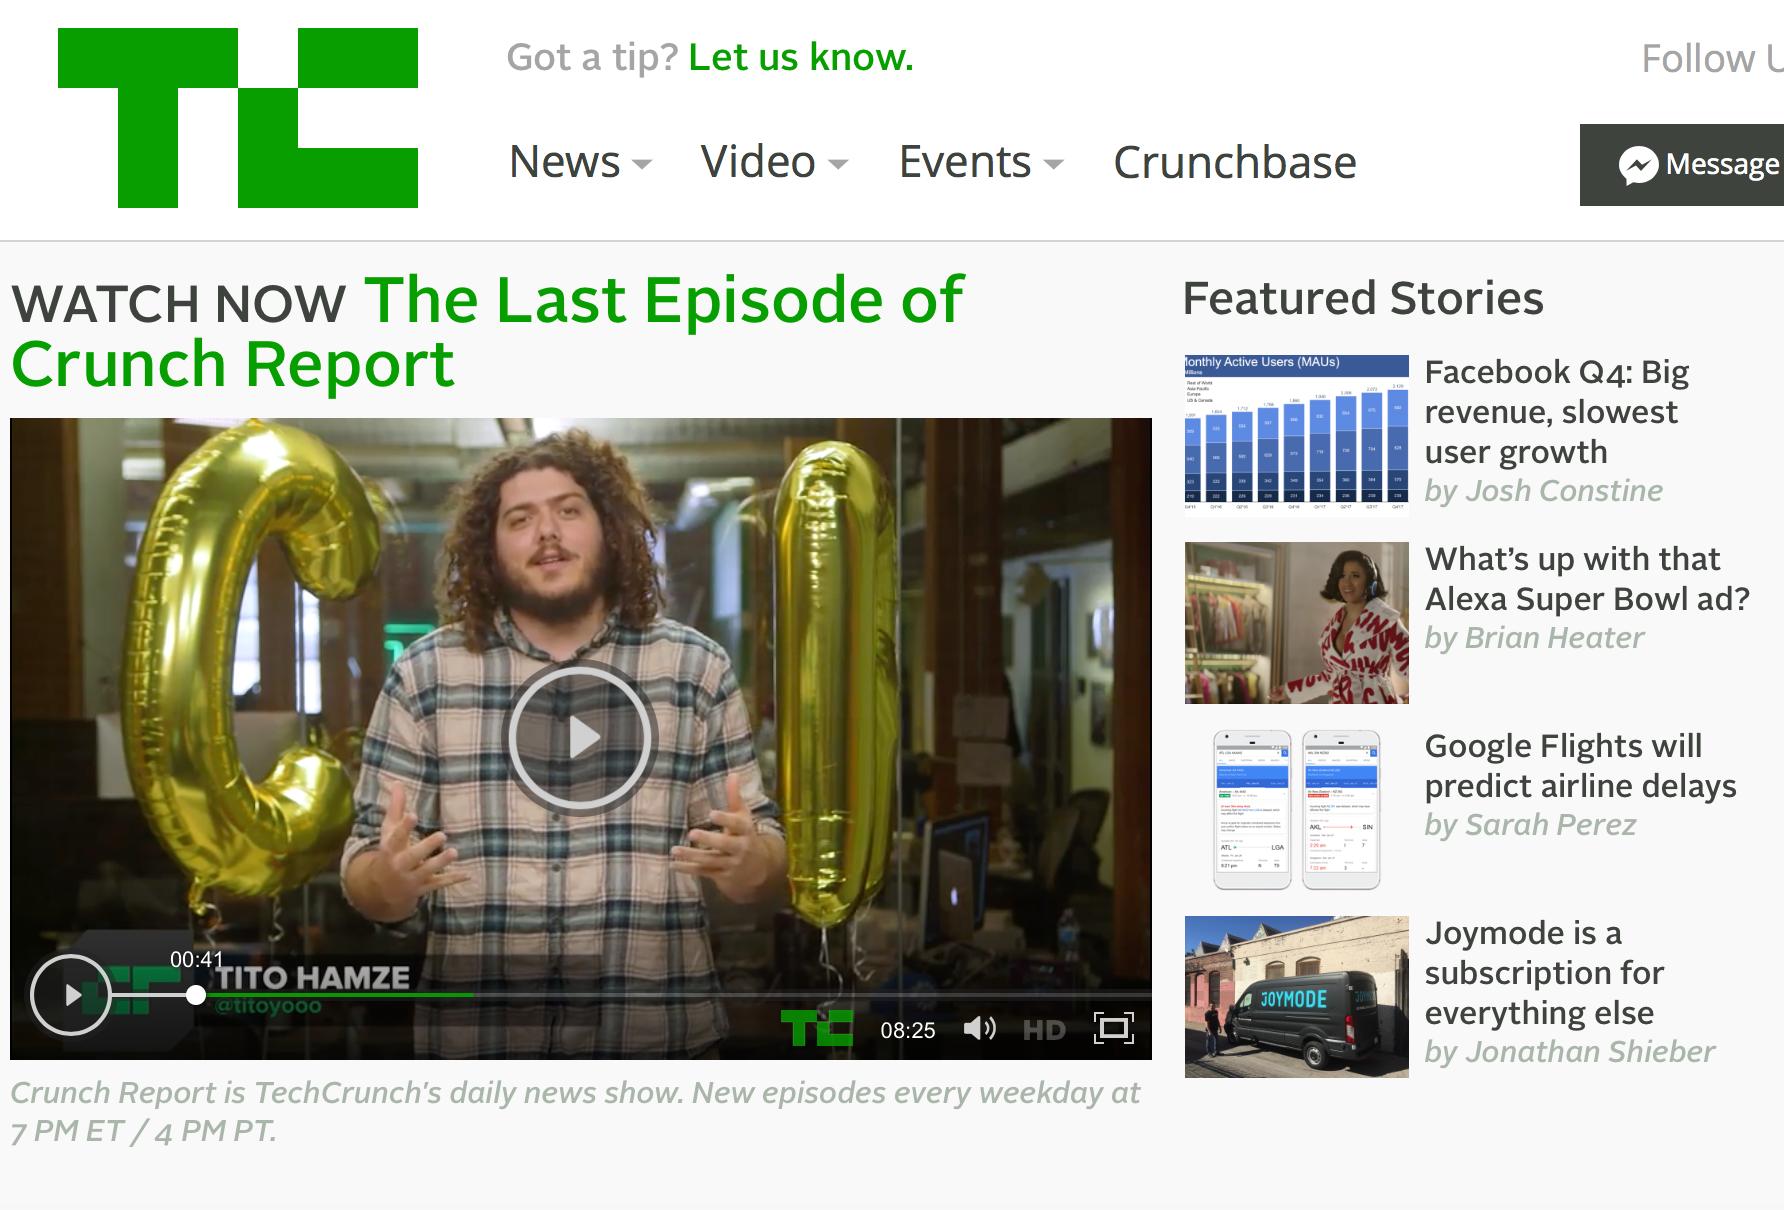 Tech Crunch,Crunch Report, Video, Online, NY Times